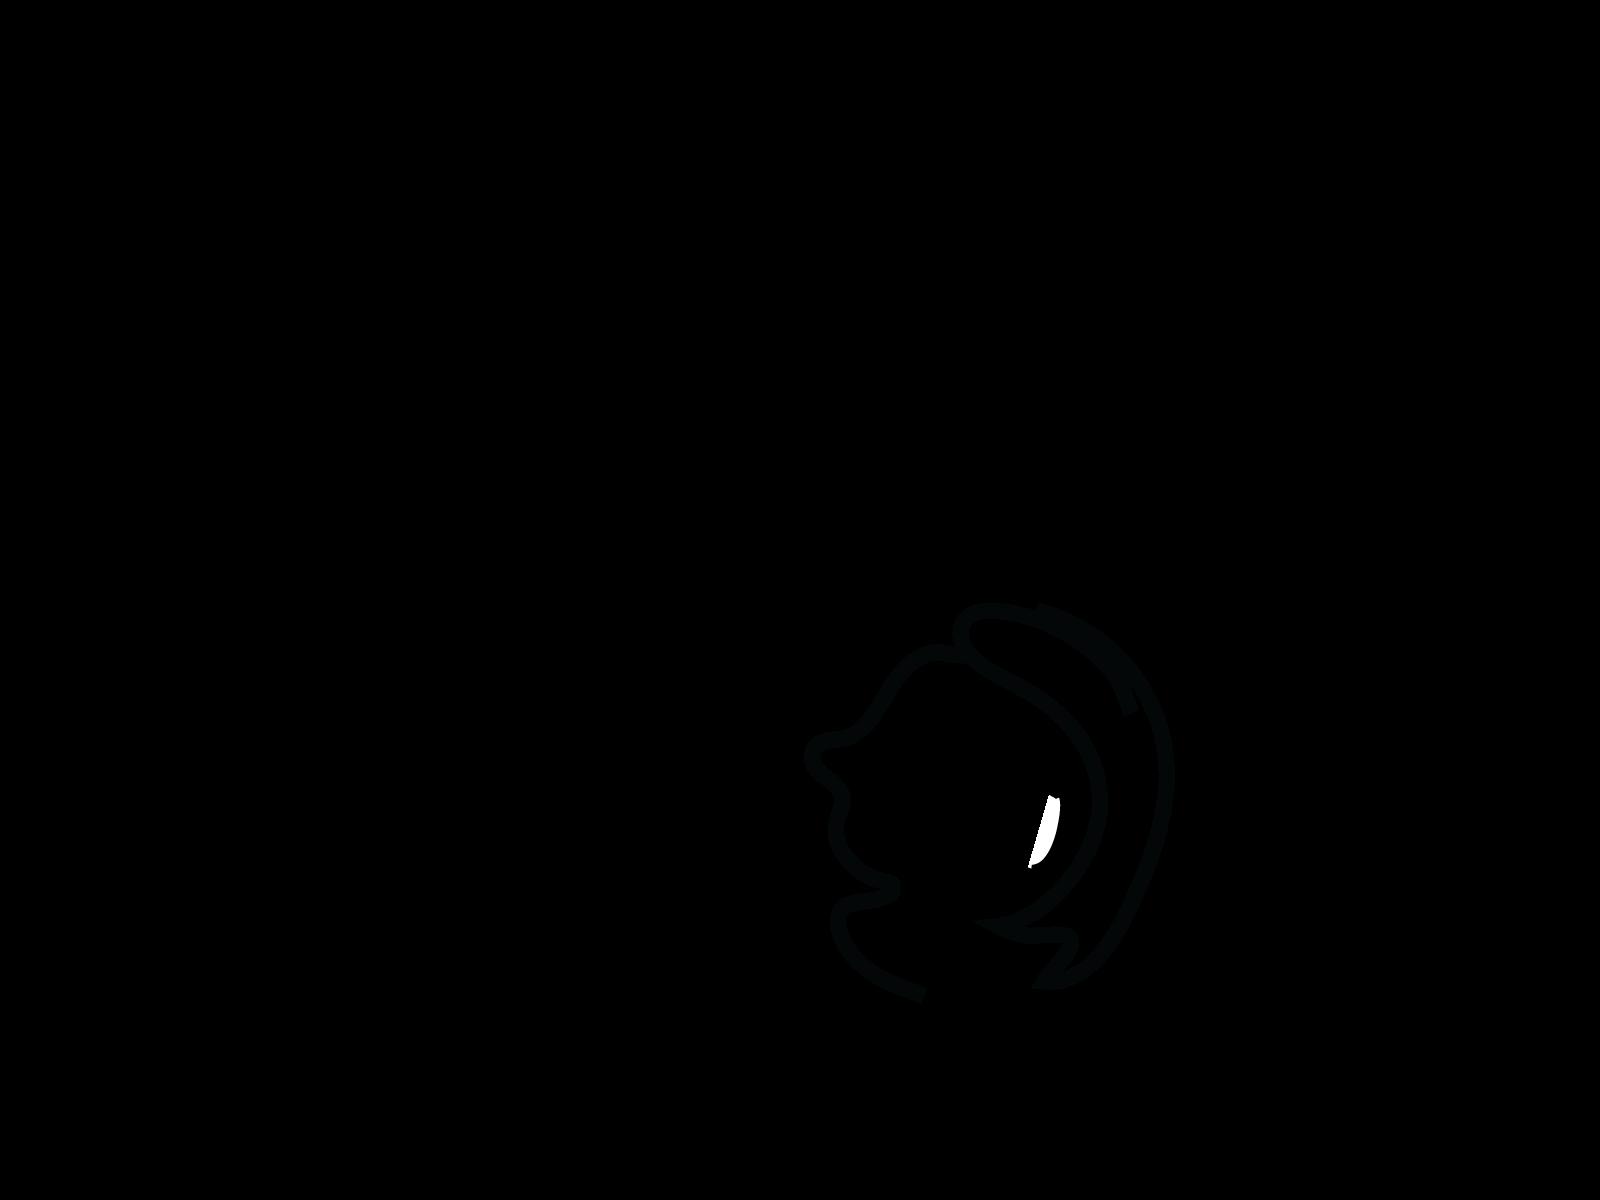 1600x1200 Drawn Image Of People Talking With Facilitator